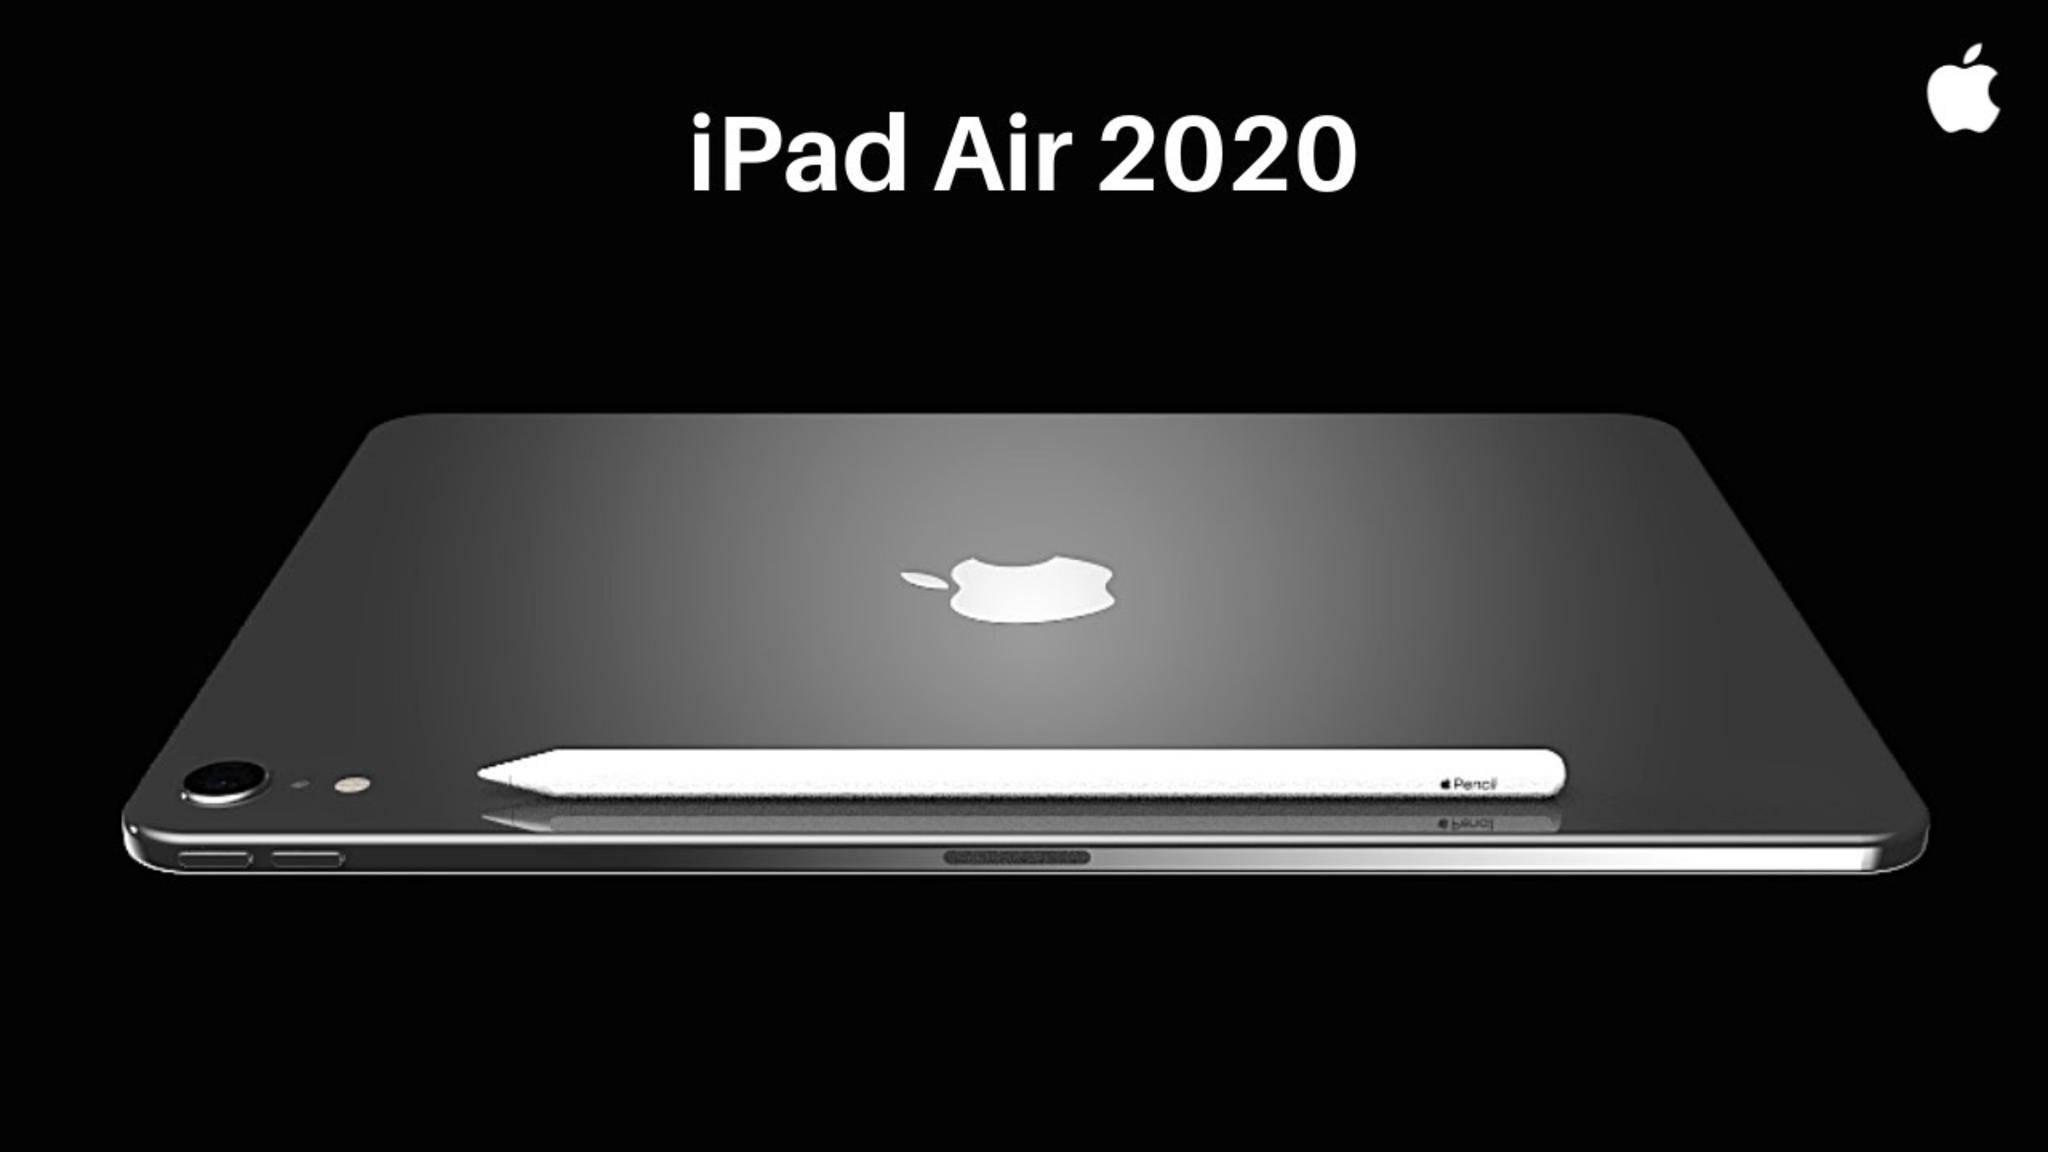 ipad-air-2020-concept